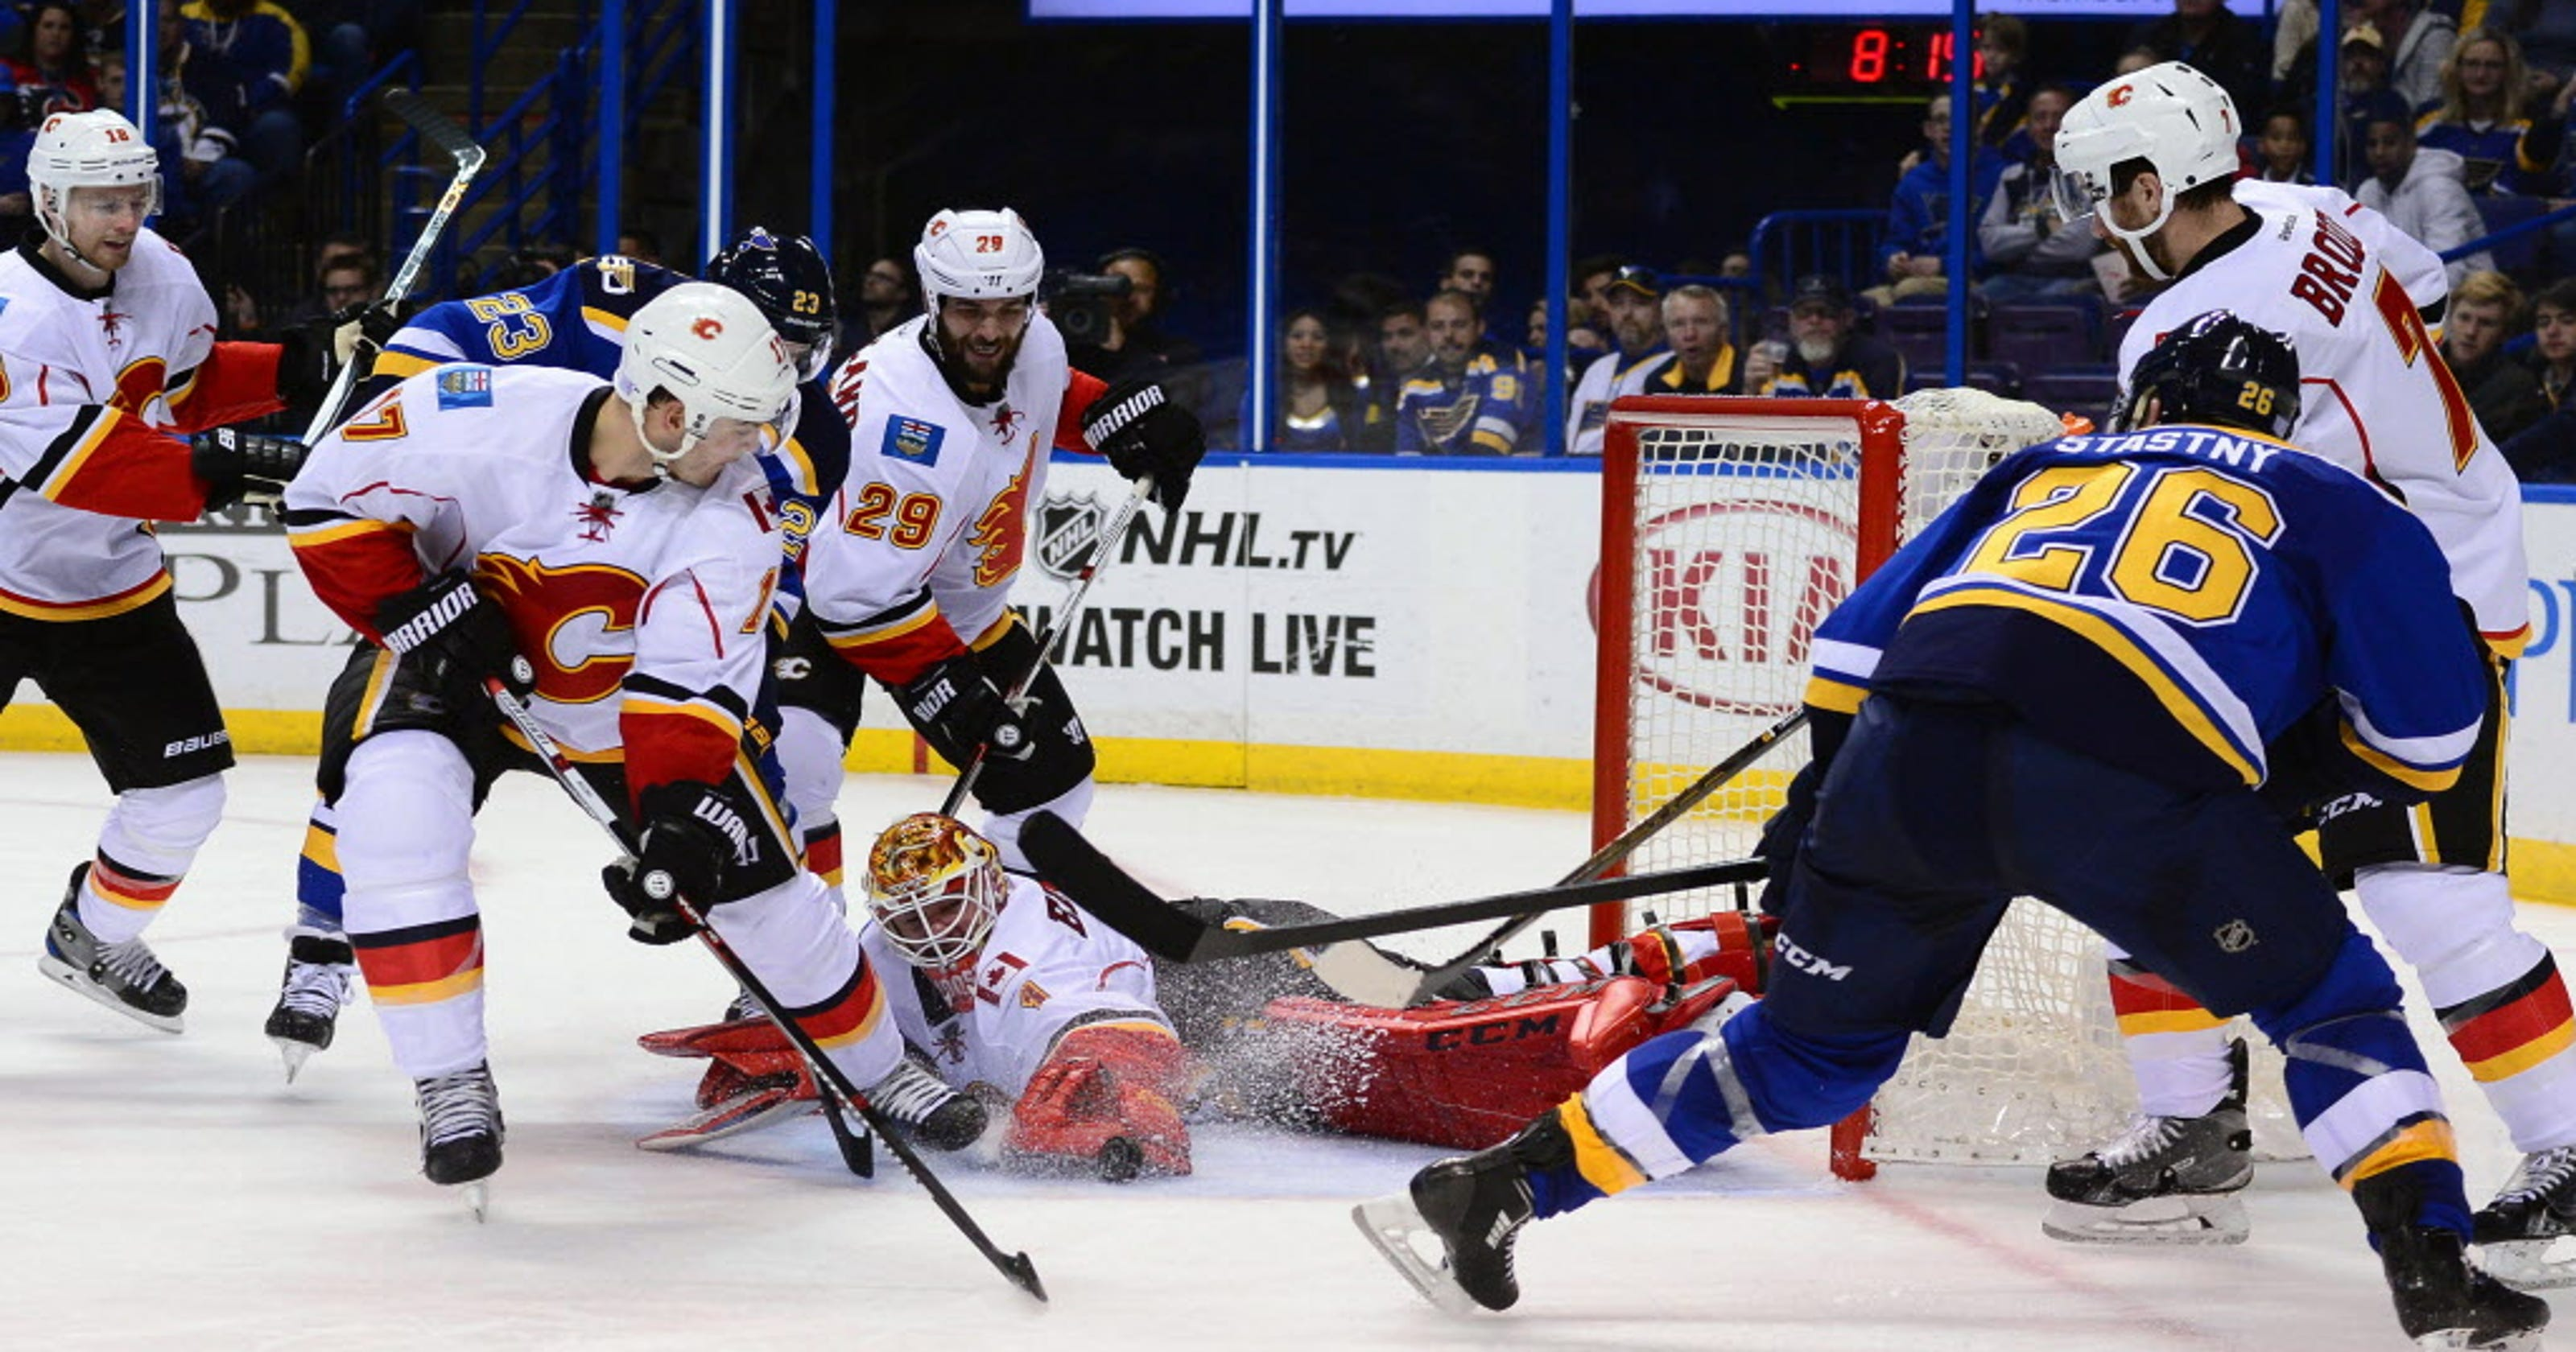 Flames goalie Brian Elliott solid in return to St. Louis